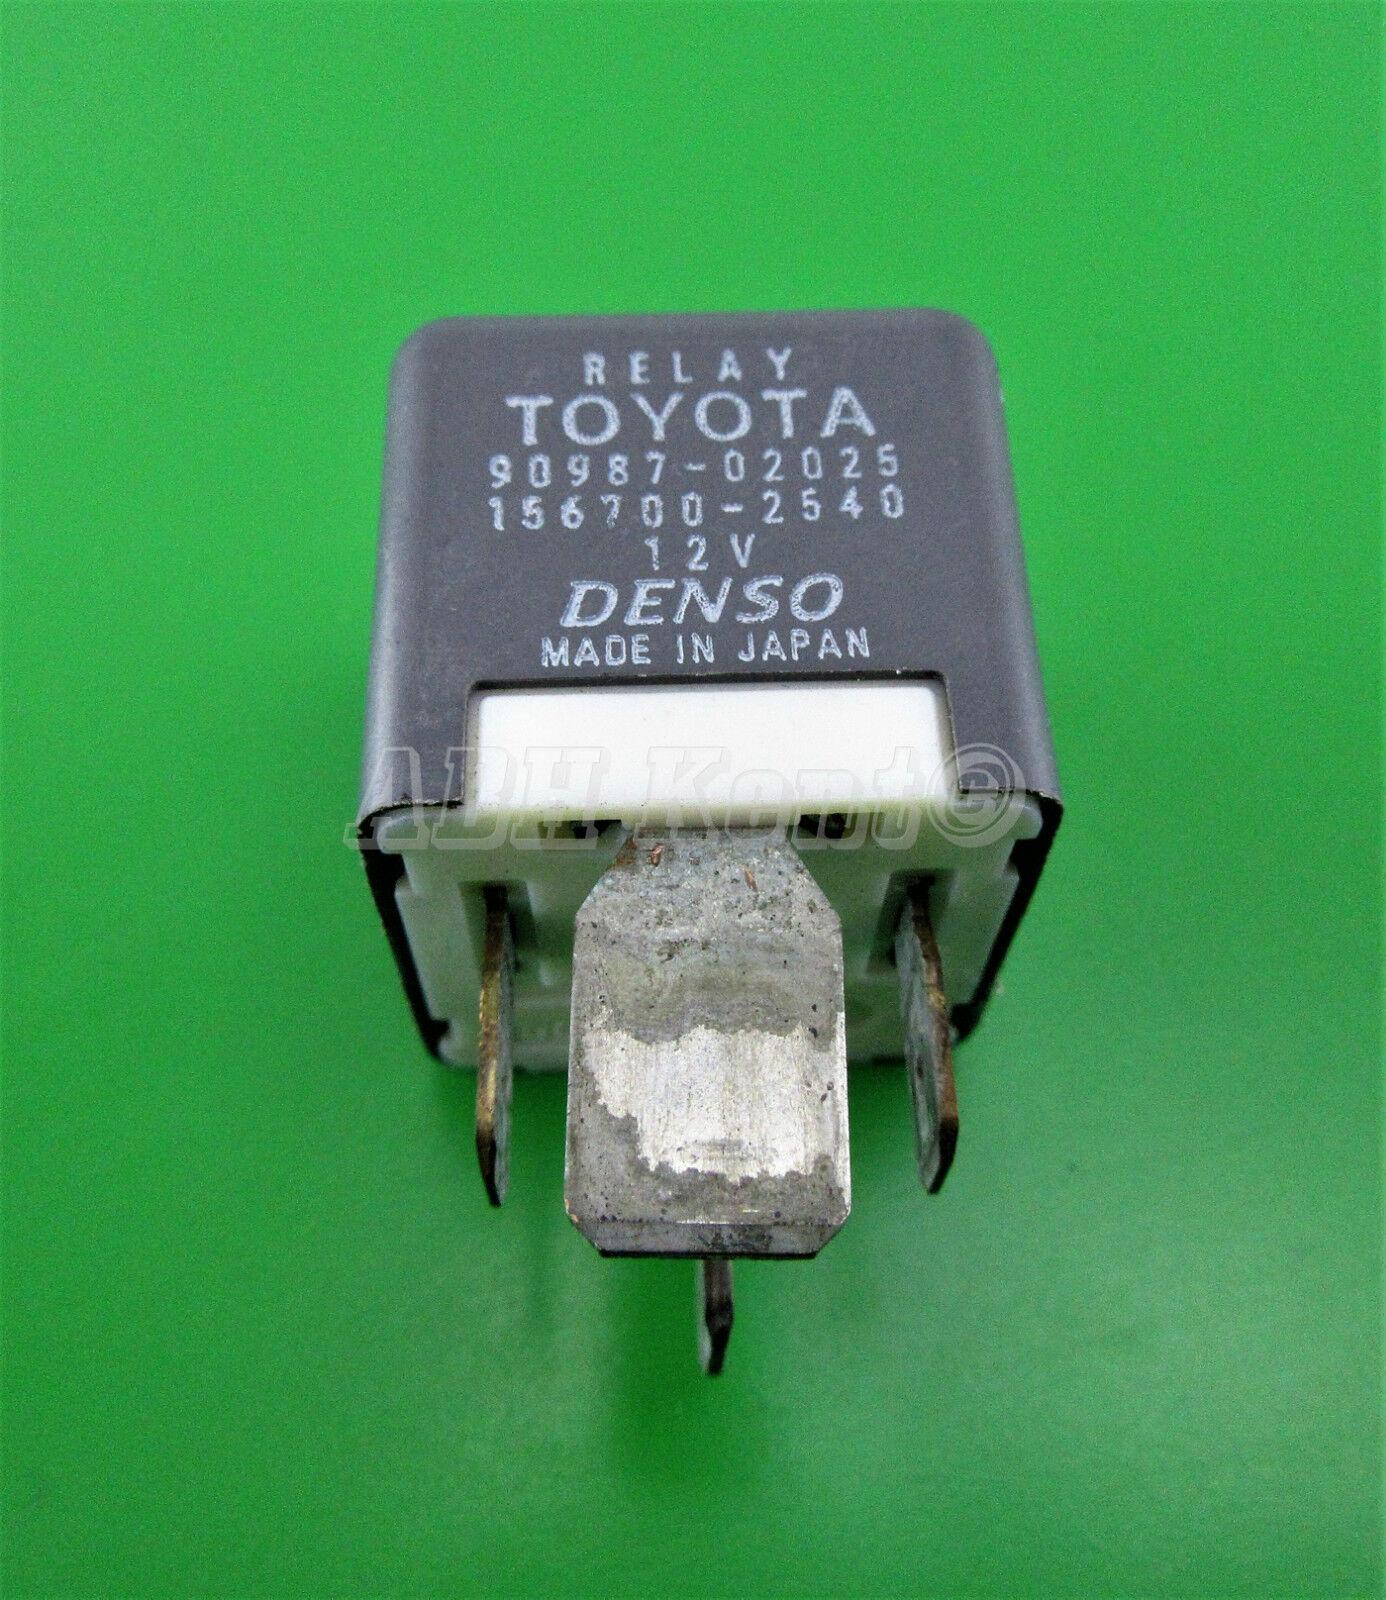 Lexus 9098702025 Ebay Defender Fuse Box Norton Secured Powered By Verisign